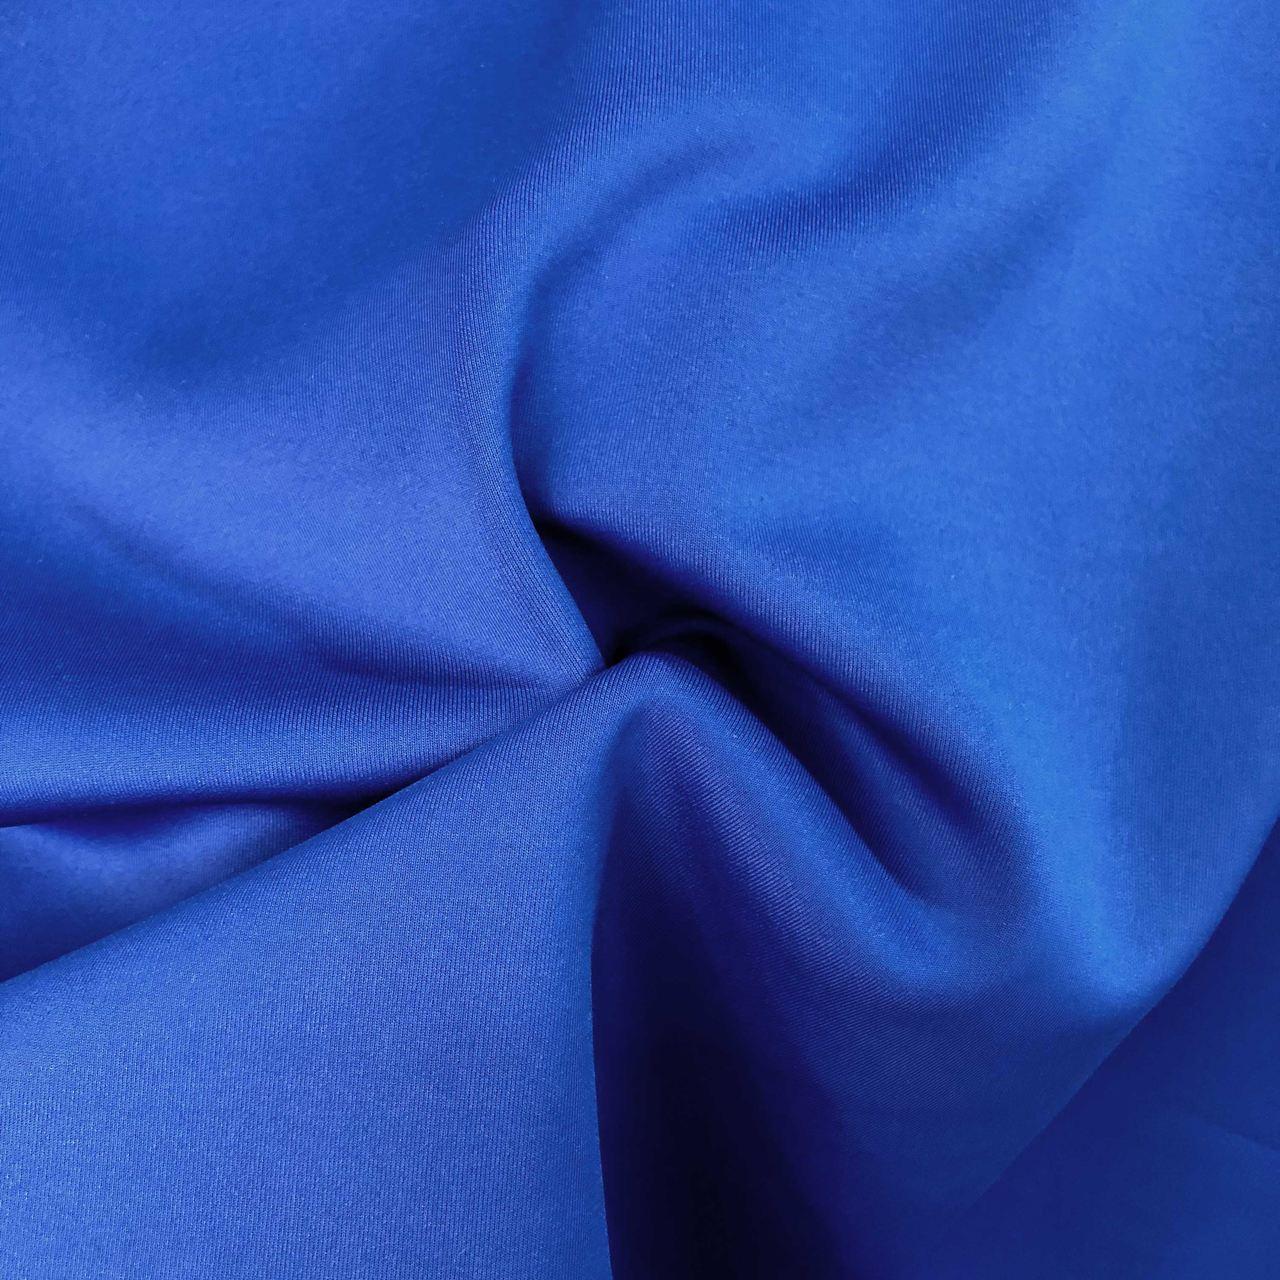 Tecido Malha Fit Neoprene 93% Poliéster 7%Elastano Azul Royal